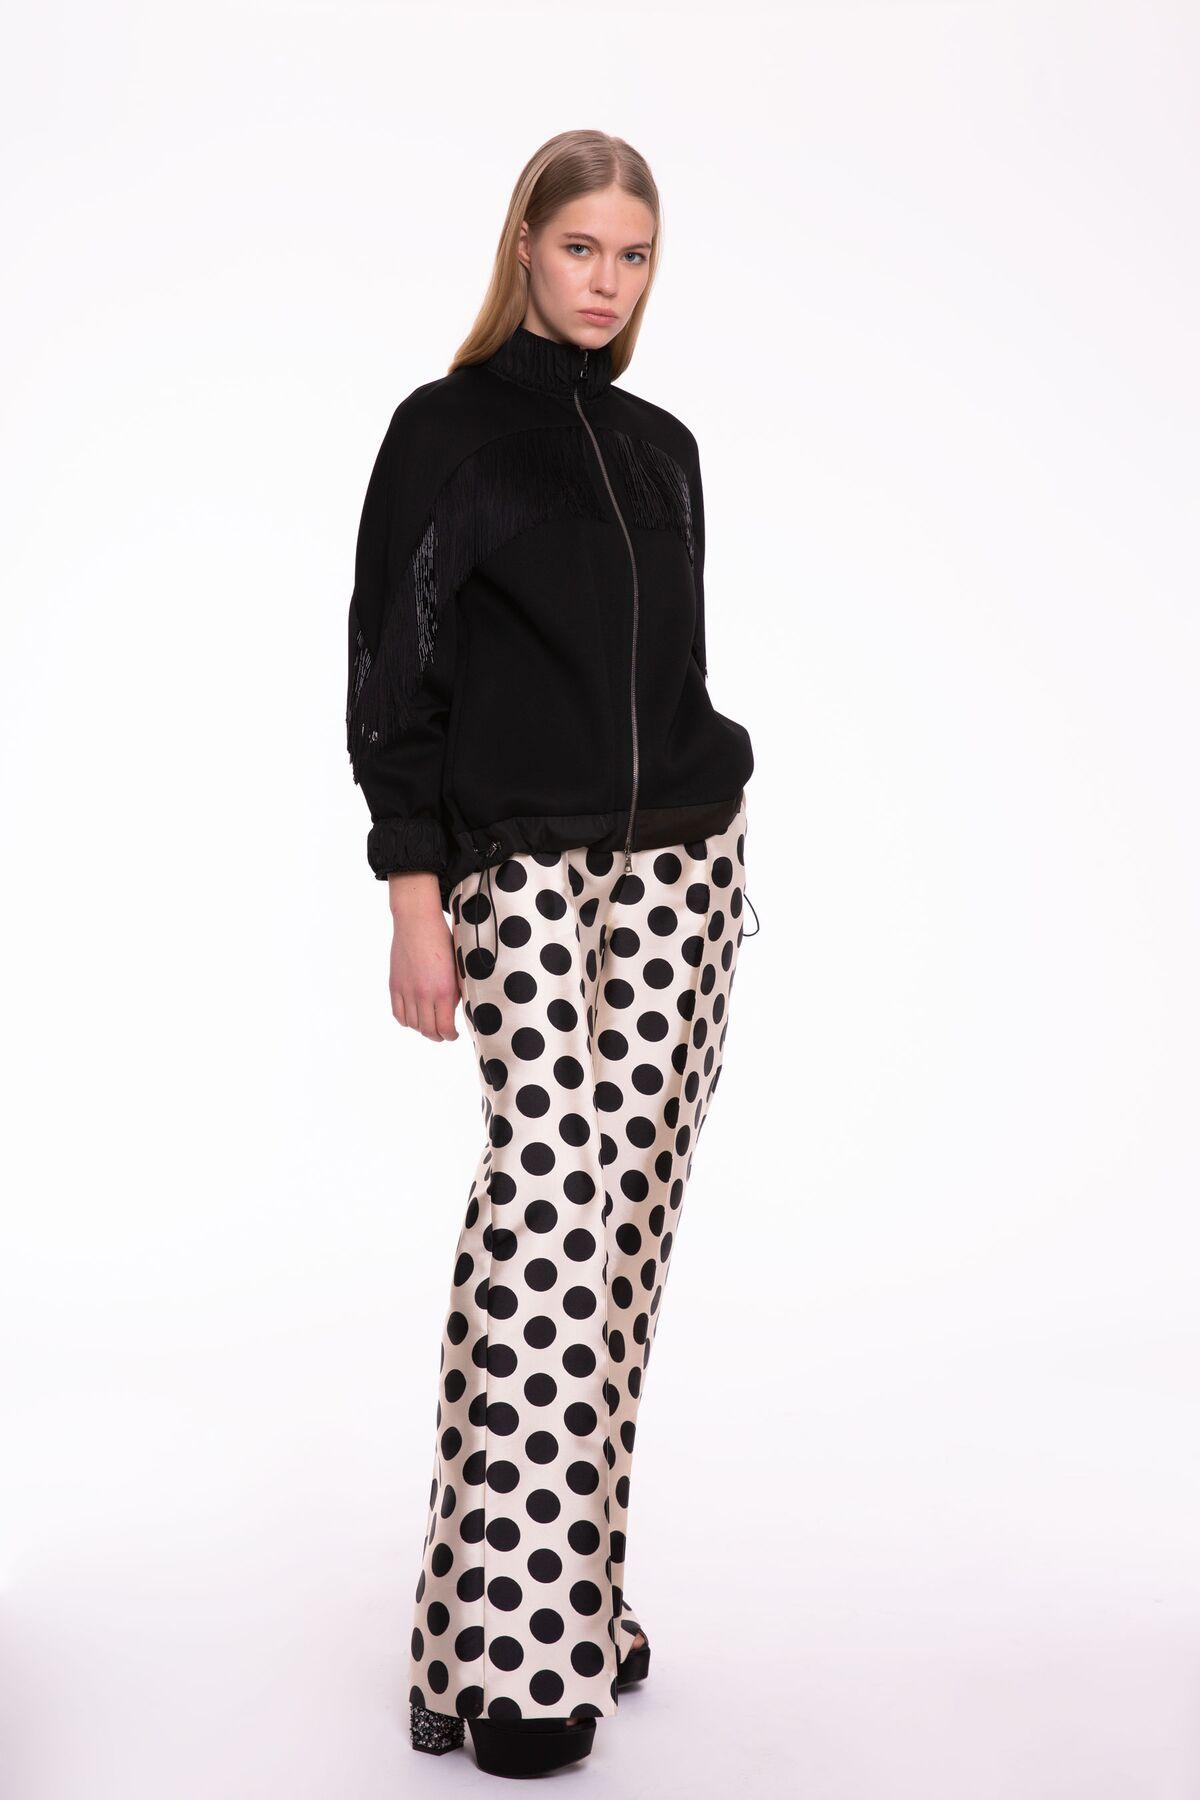 Siyah-Beyaz Puantiye Desenli, Bol Paça Pantolon